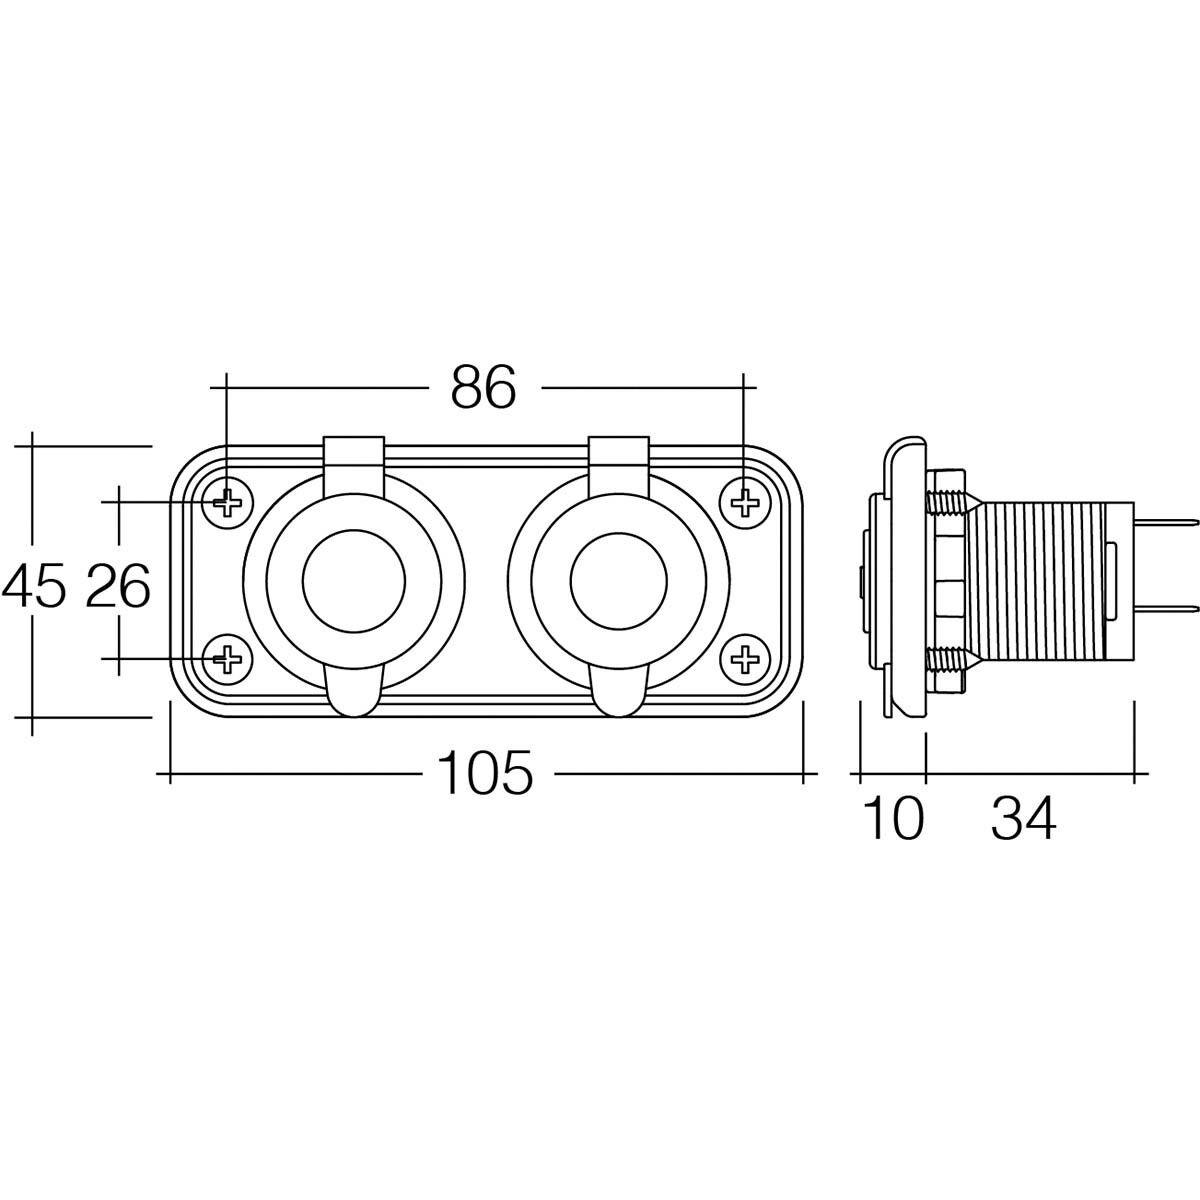 small resolution of 12 24v twin accessory usb socket heavy duty acc dual usb